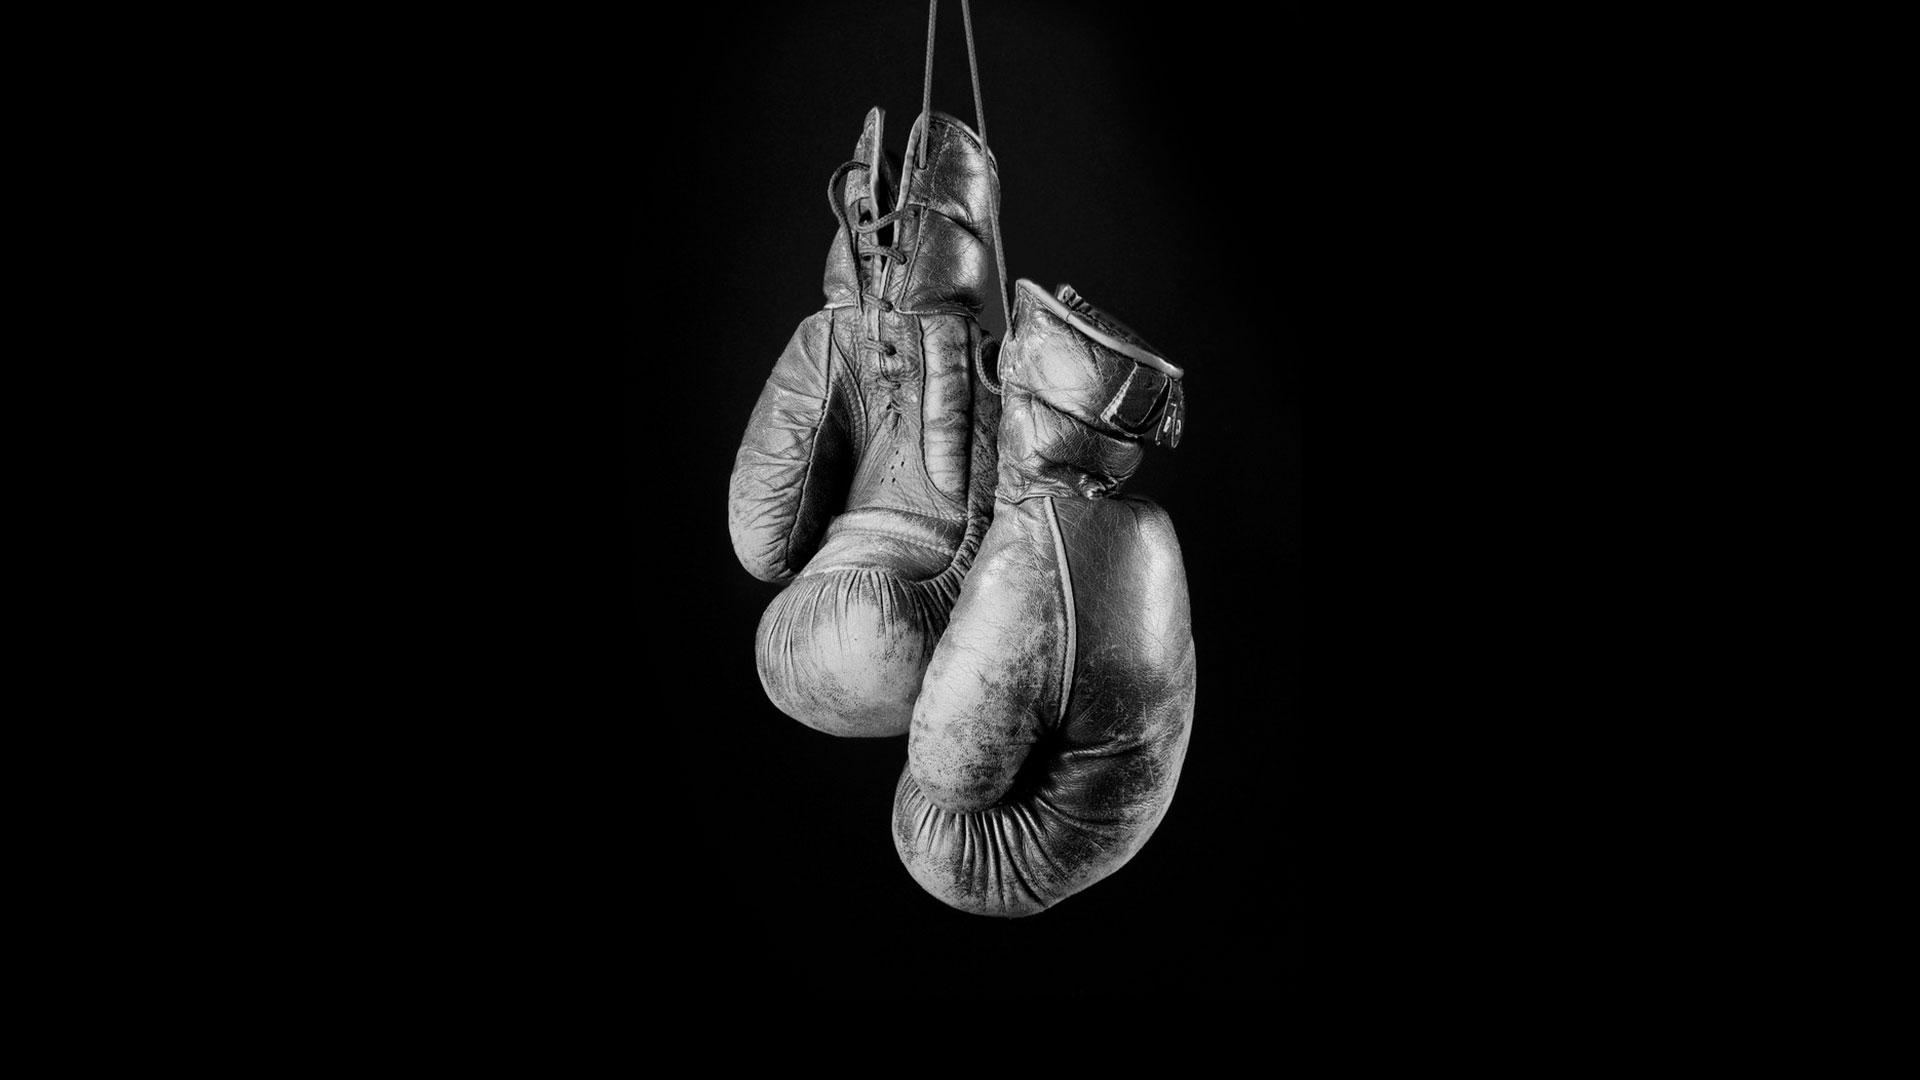 Sugar Ray Robinson: The Bright Lights & Dark Shadows of a Champion